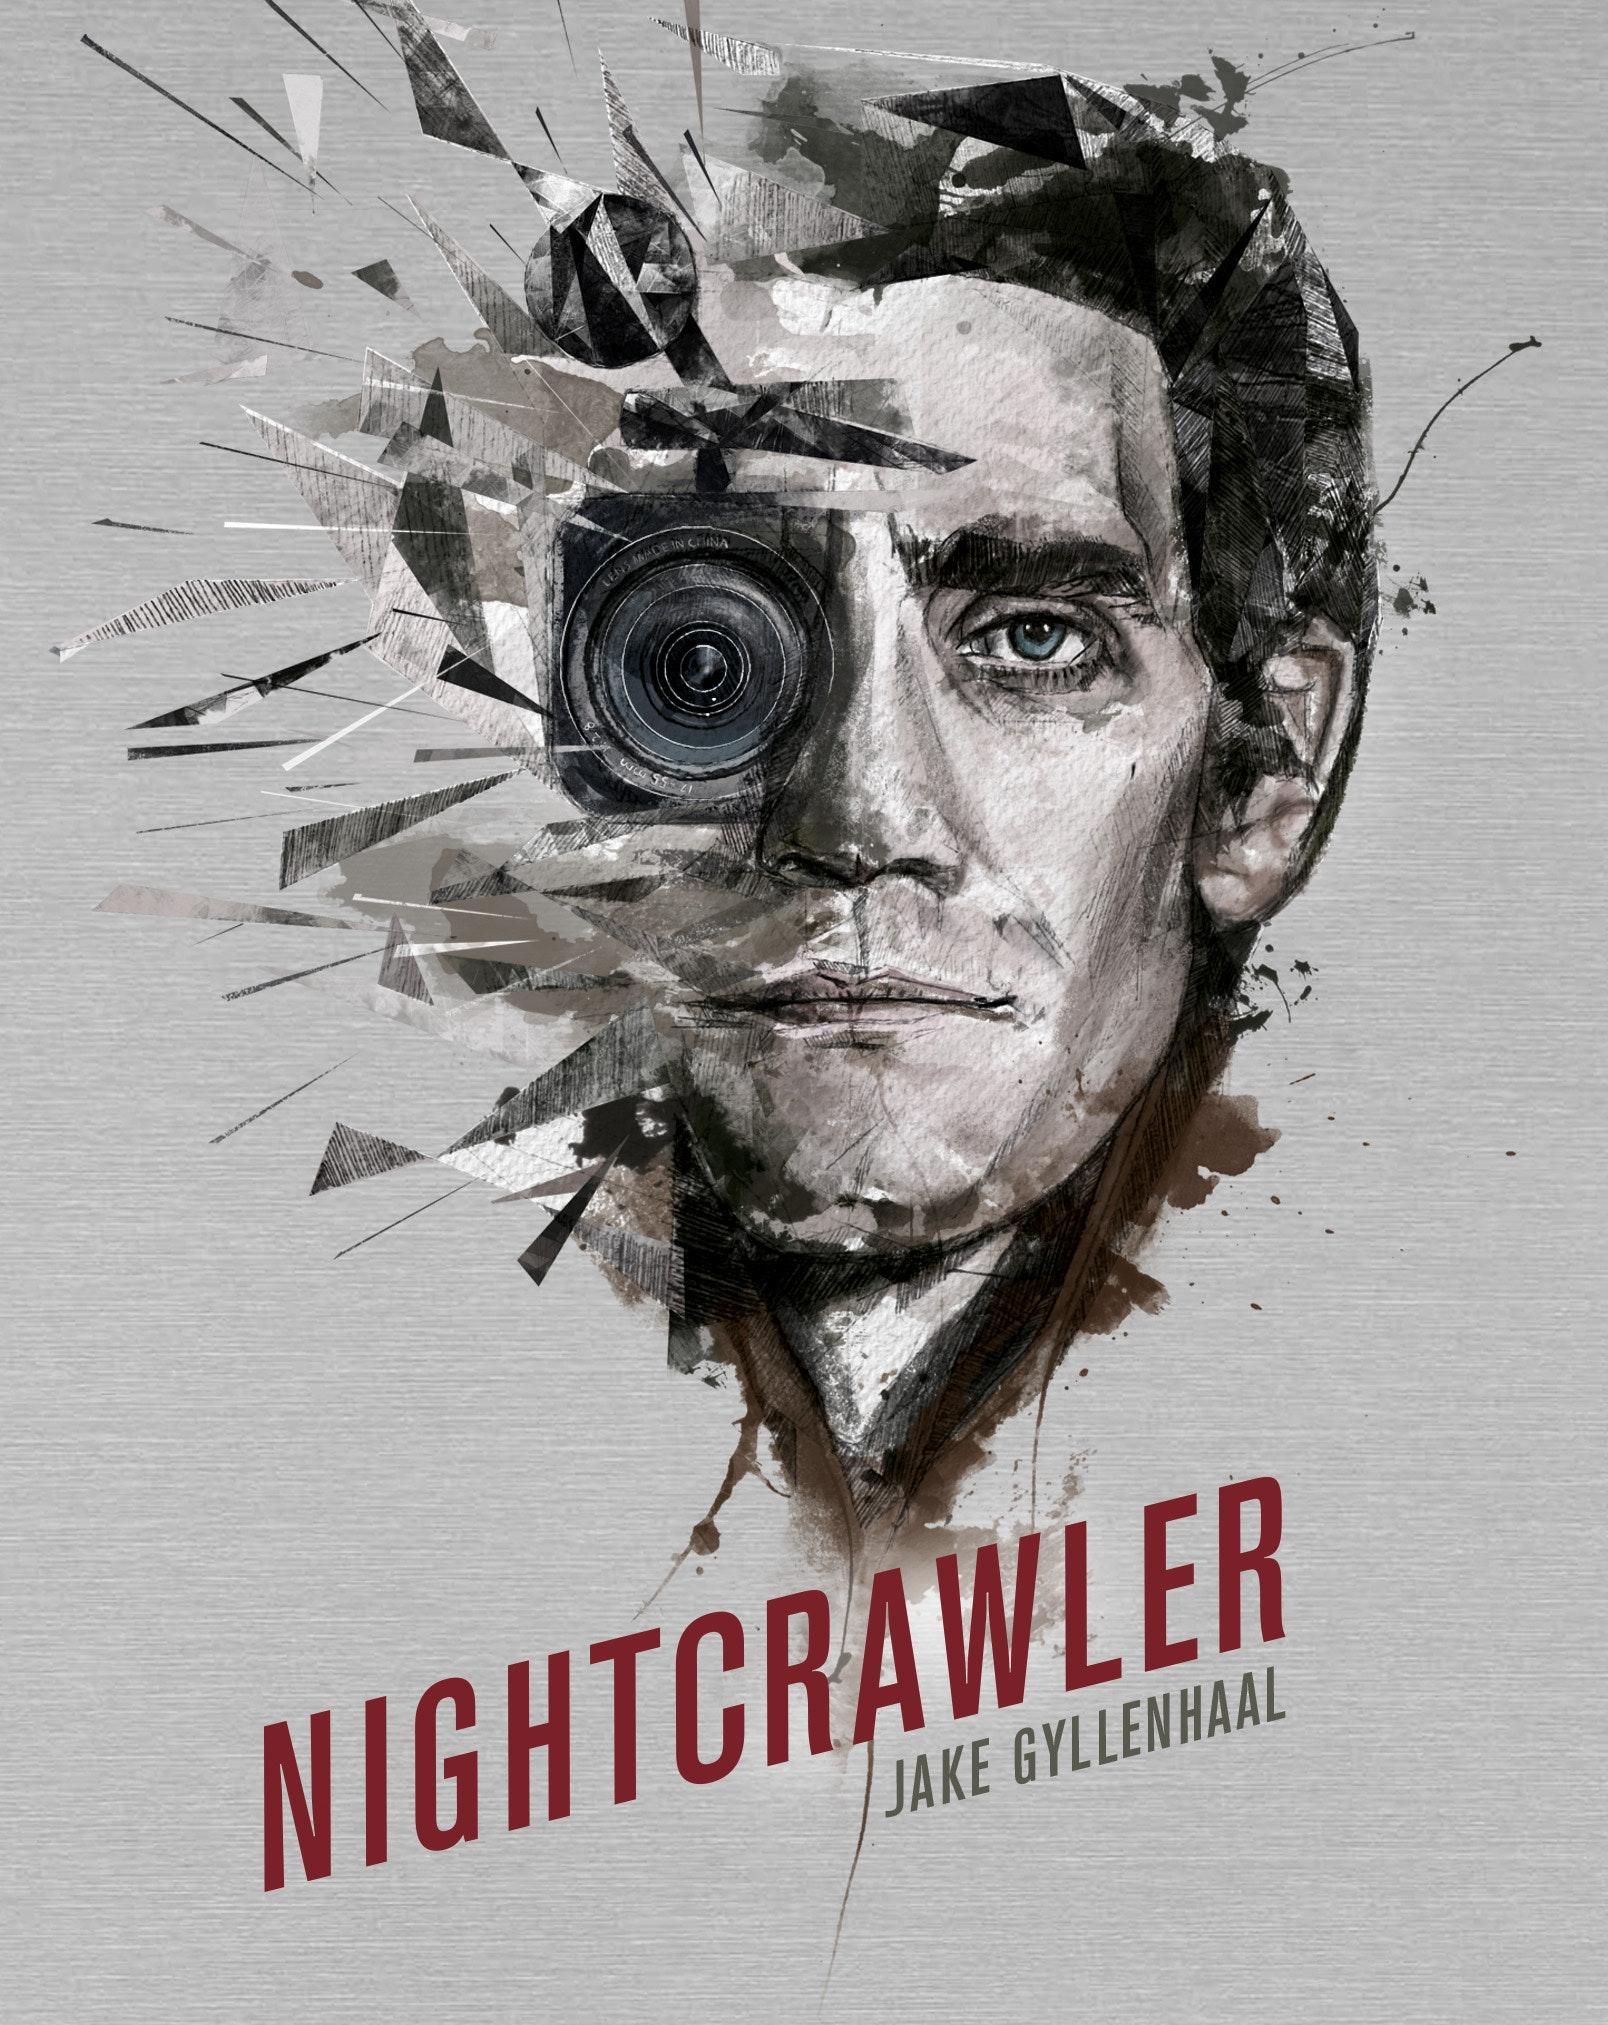 Nightcrawler br steelbook front 2d